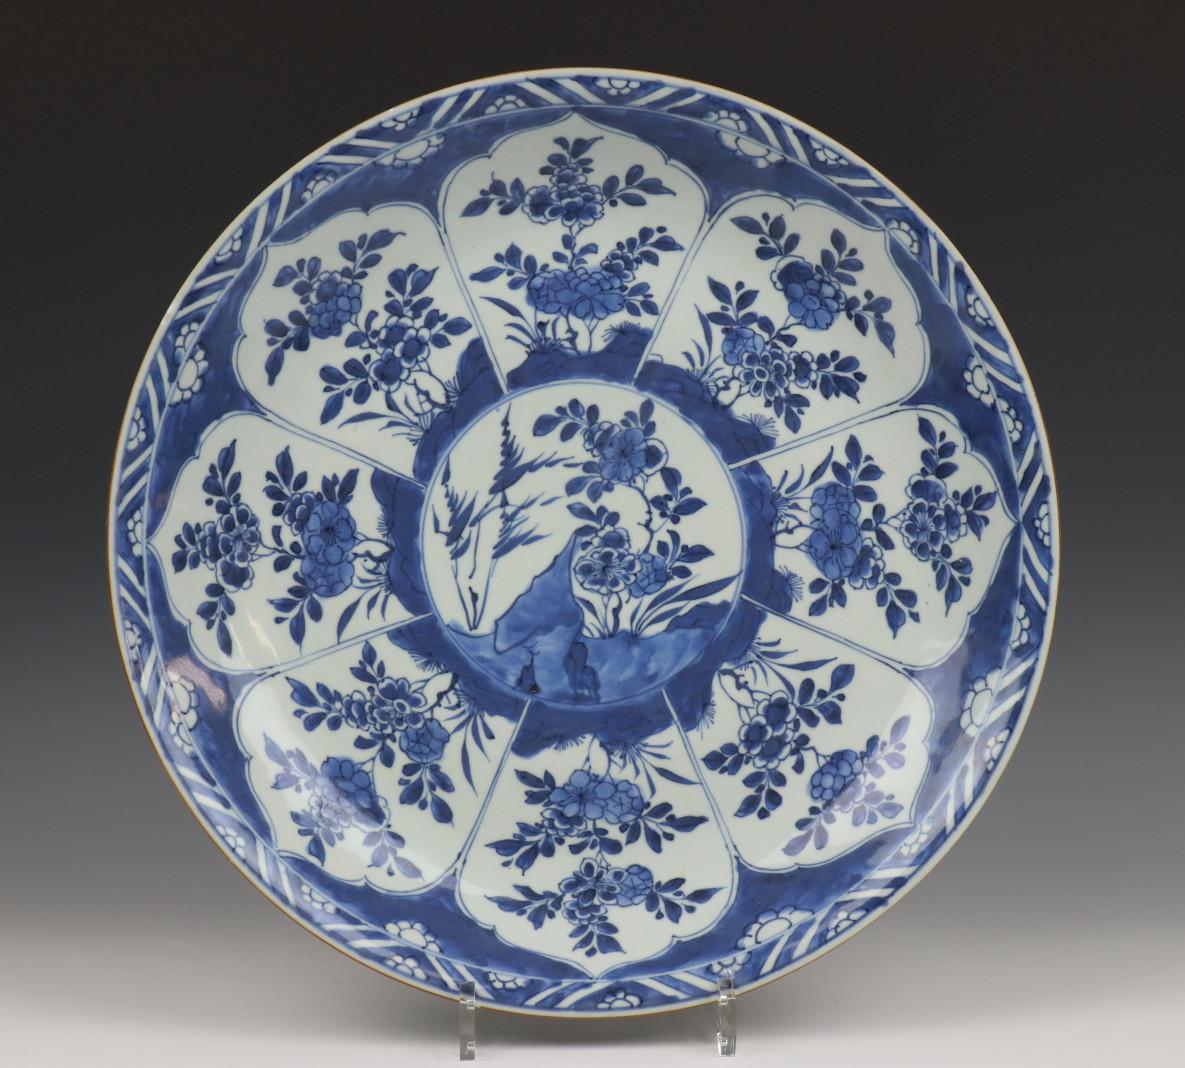 China, blauw-wit porseleinen schotel, laat Kangxi,